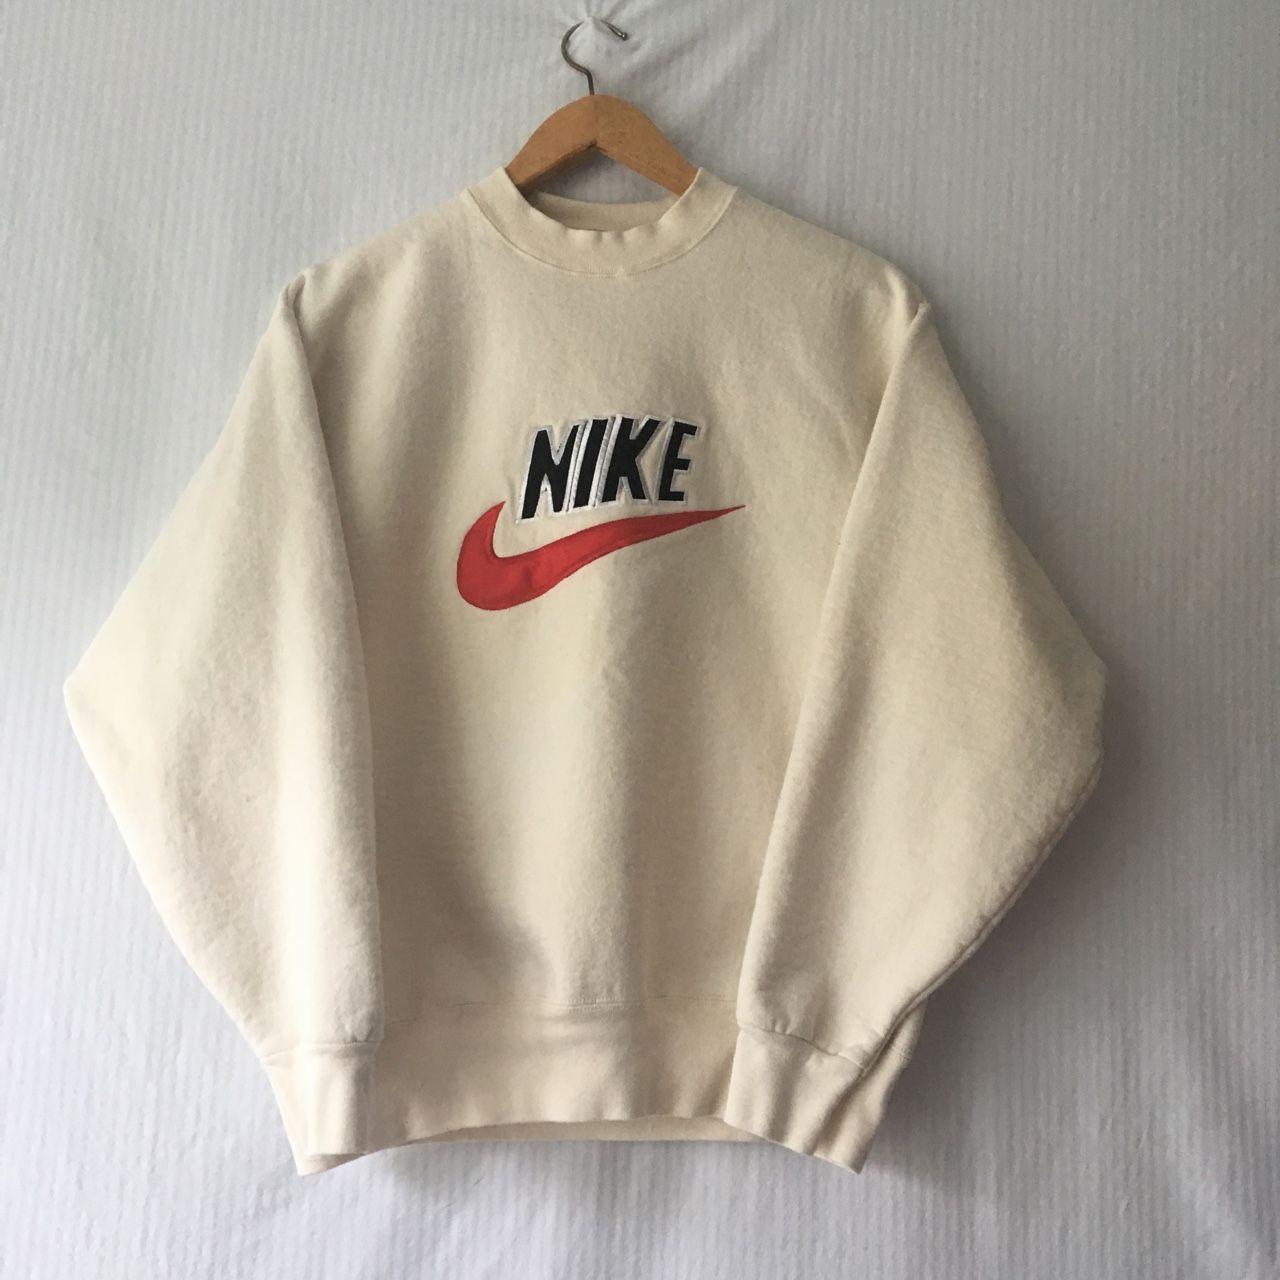 Vintage 90s Nike Crewneck Nice Cream Color With The Depop Vintage Nike Sweatshirt Vintage Hoodies Nike Crewneck Sweatshirt [ 1280 x 1280 Pixel ]